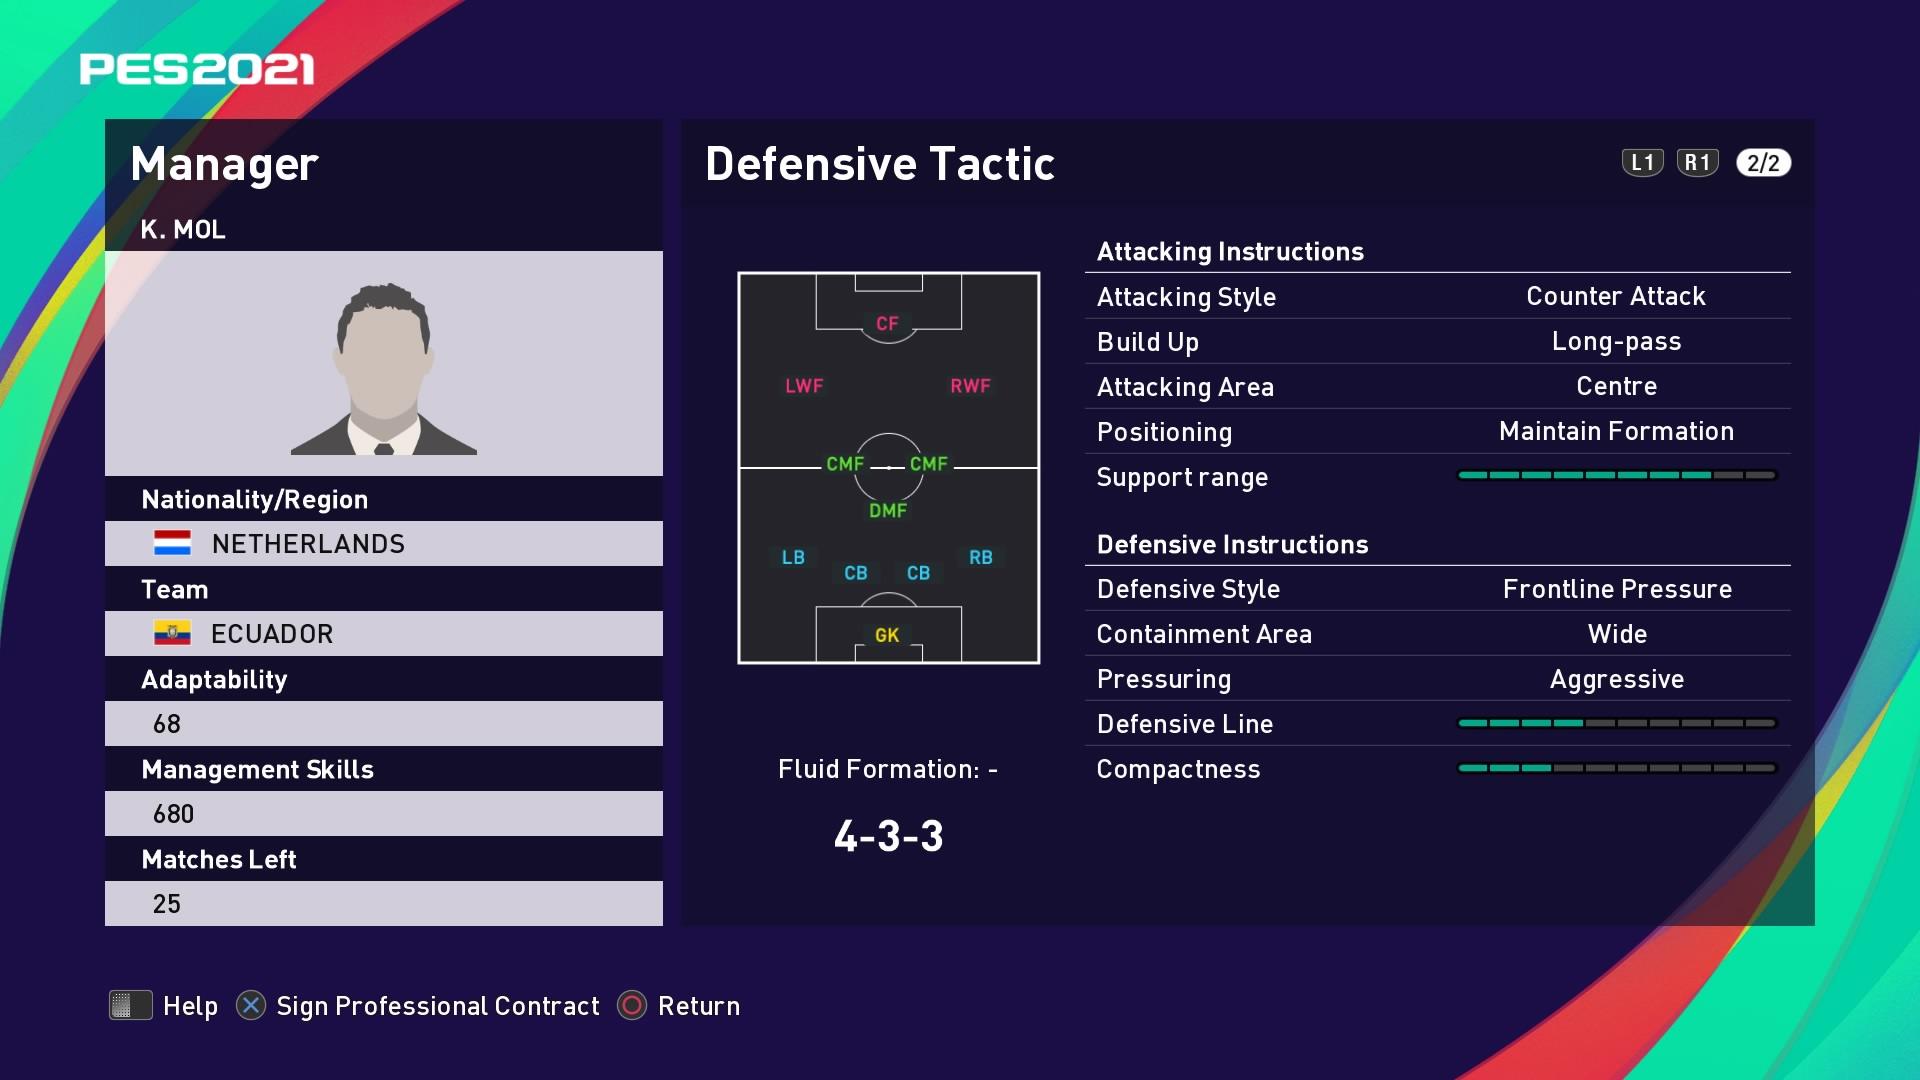 K. Mol (Jordi Cruyff) Defensive Tactic in PES 2021 myClub